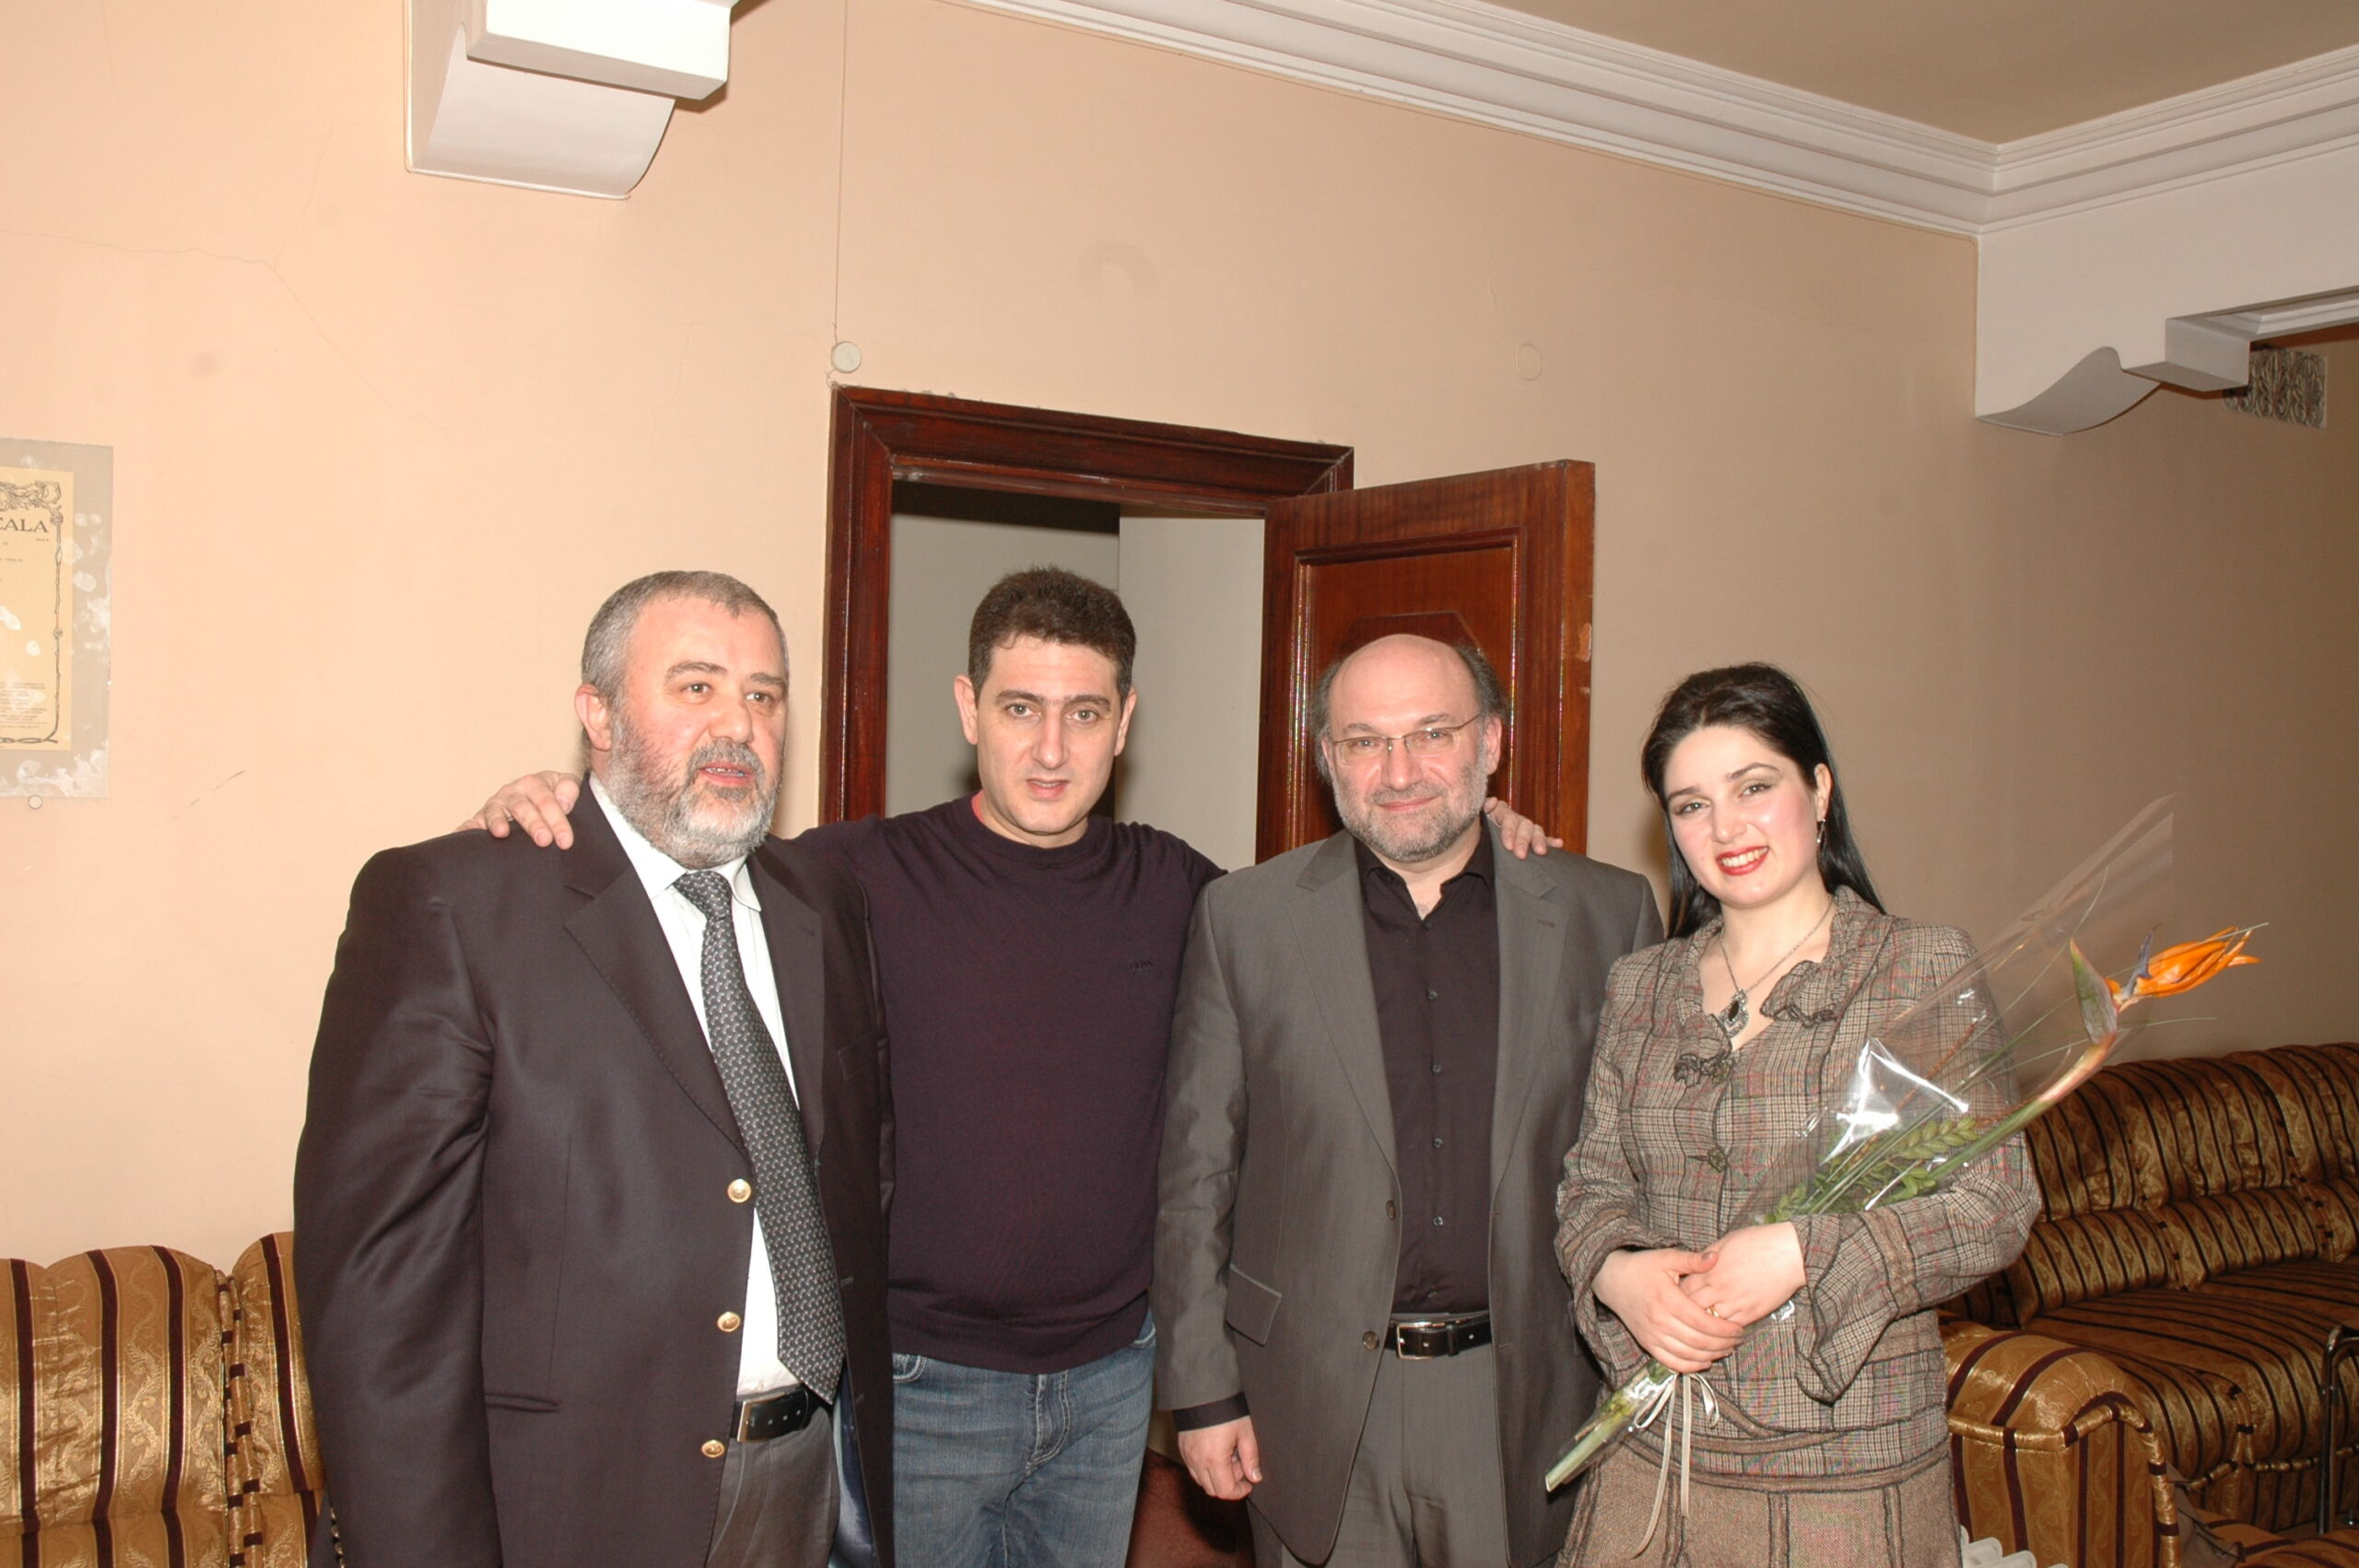 With Robert Mlkeyan, Eduard Topchyan, Syuzanna Melkonyan